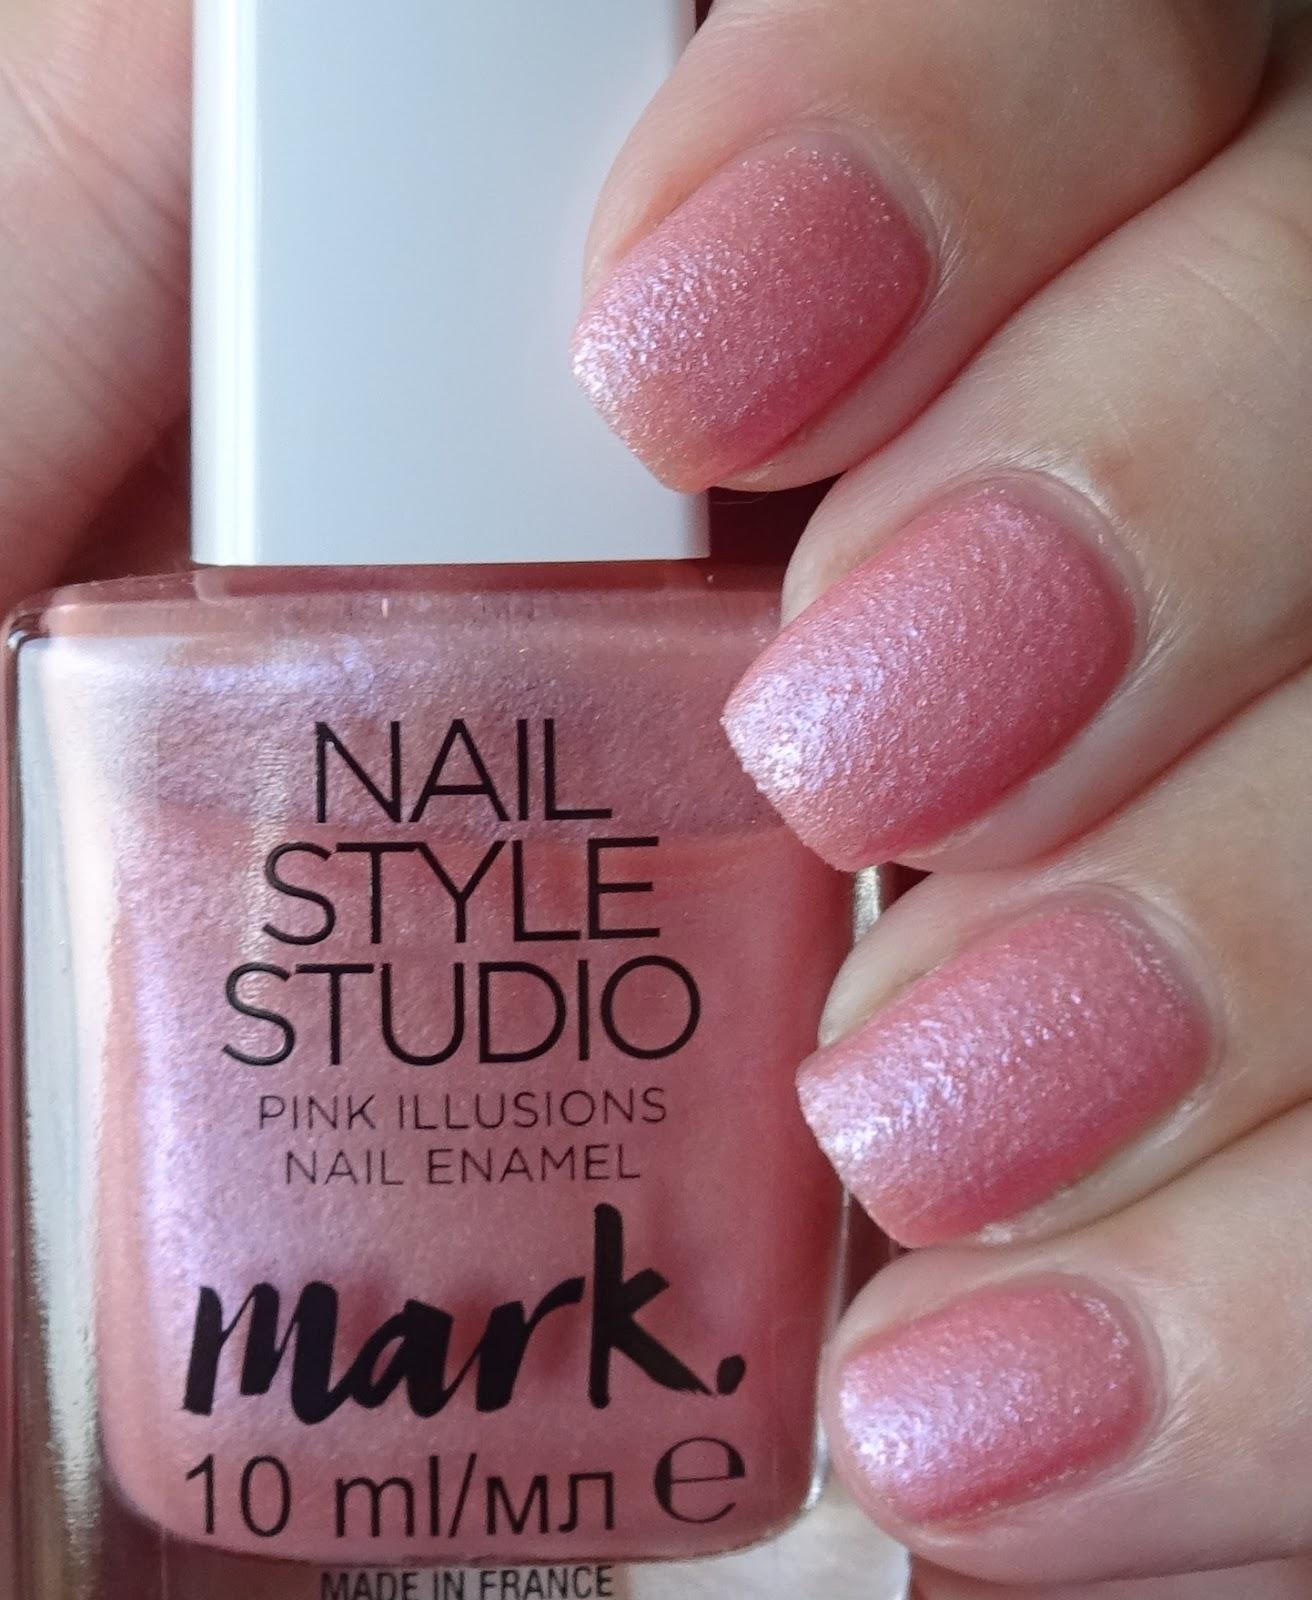 Studio M Nail Polish: Wendy's Delights: Avon Mark Nail Style Studio Nail Enamel